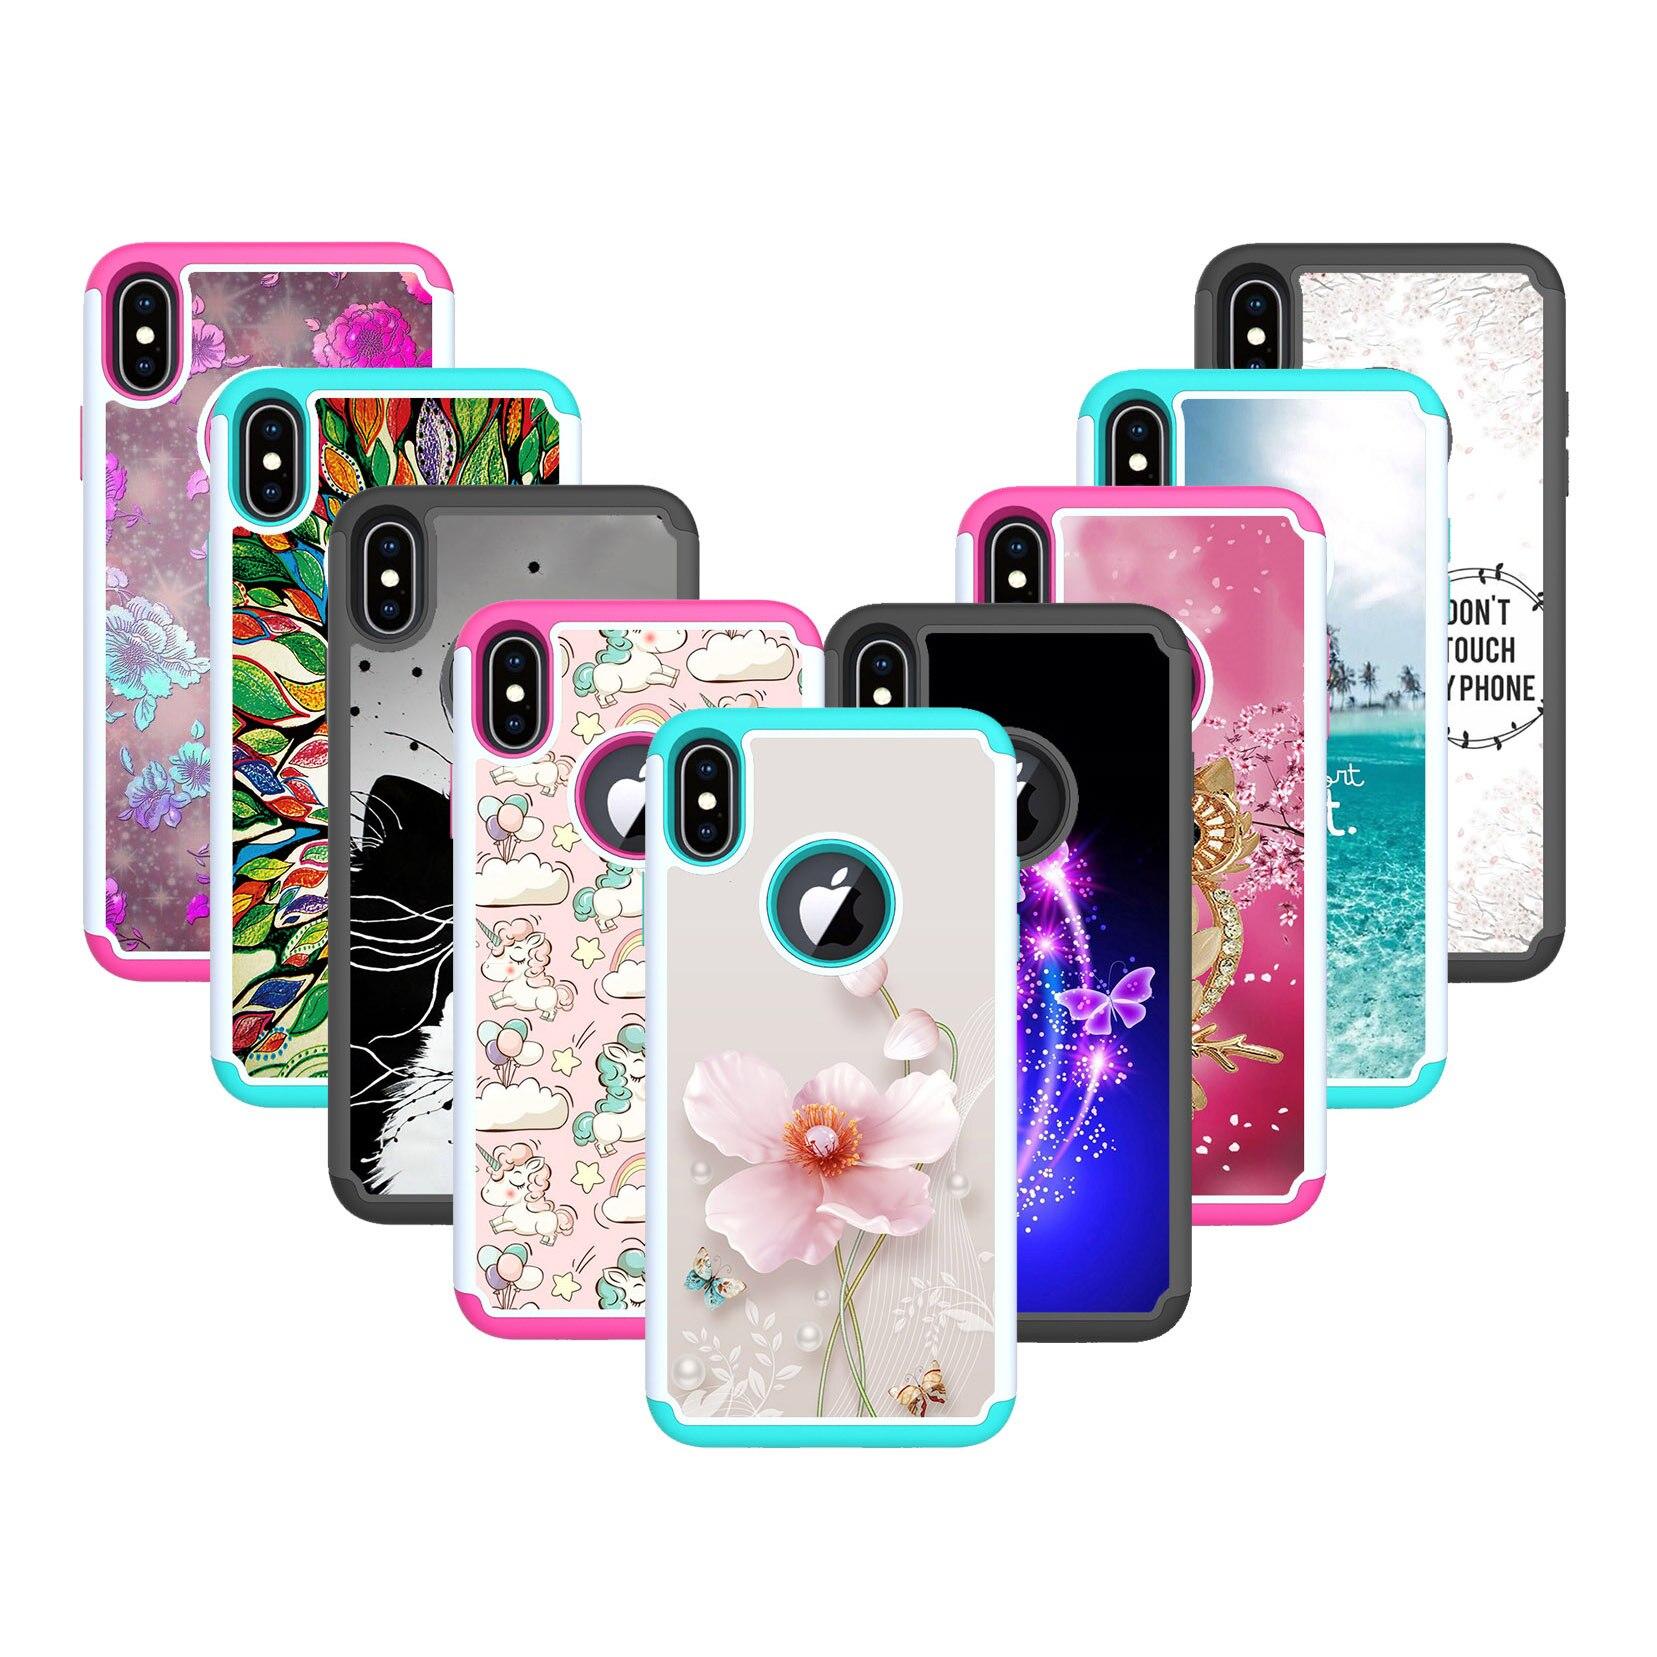 Pintado pele silício PC 2 em casos Para iphone 7 1 plus 8plus Case colorful Je Anti-knock back capa Para O iphone X XSmax capa